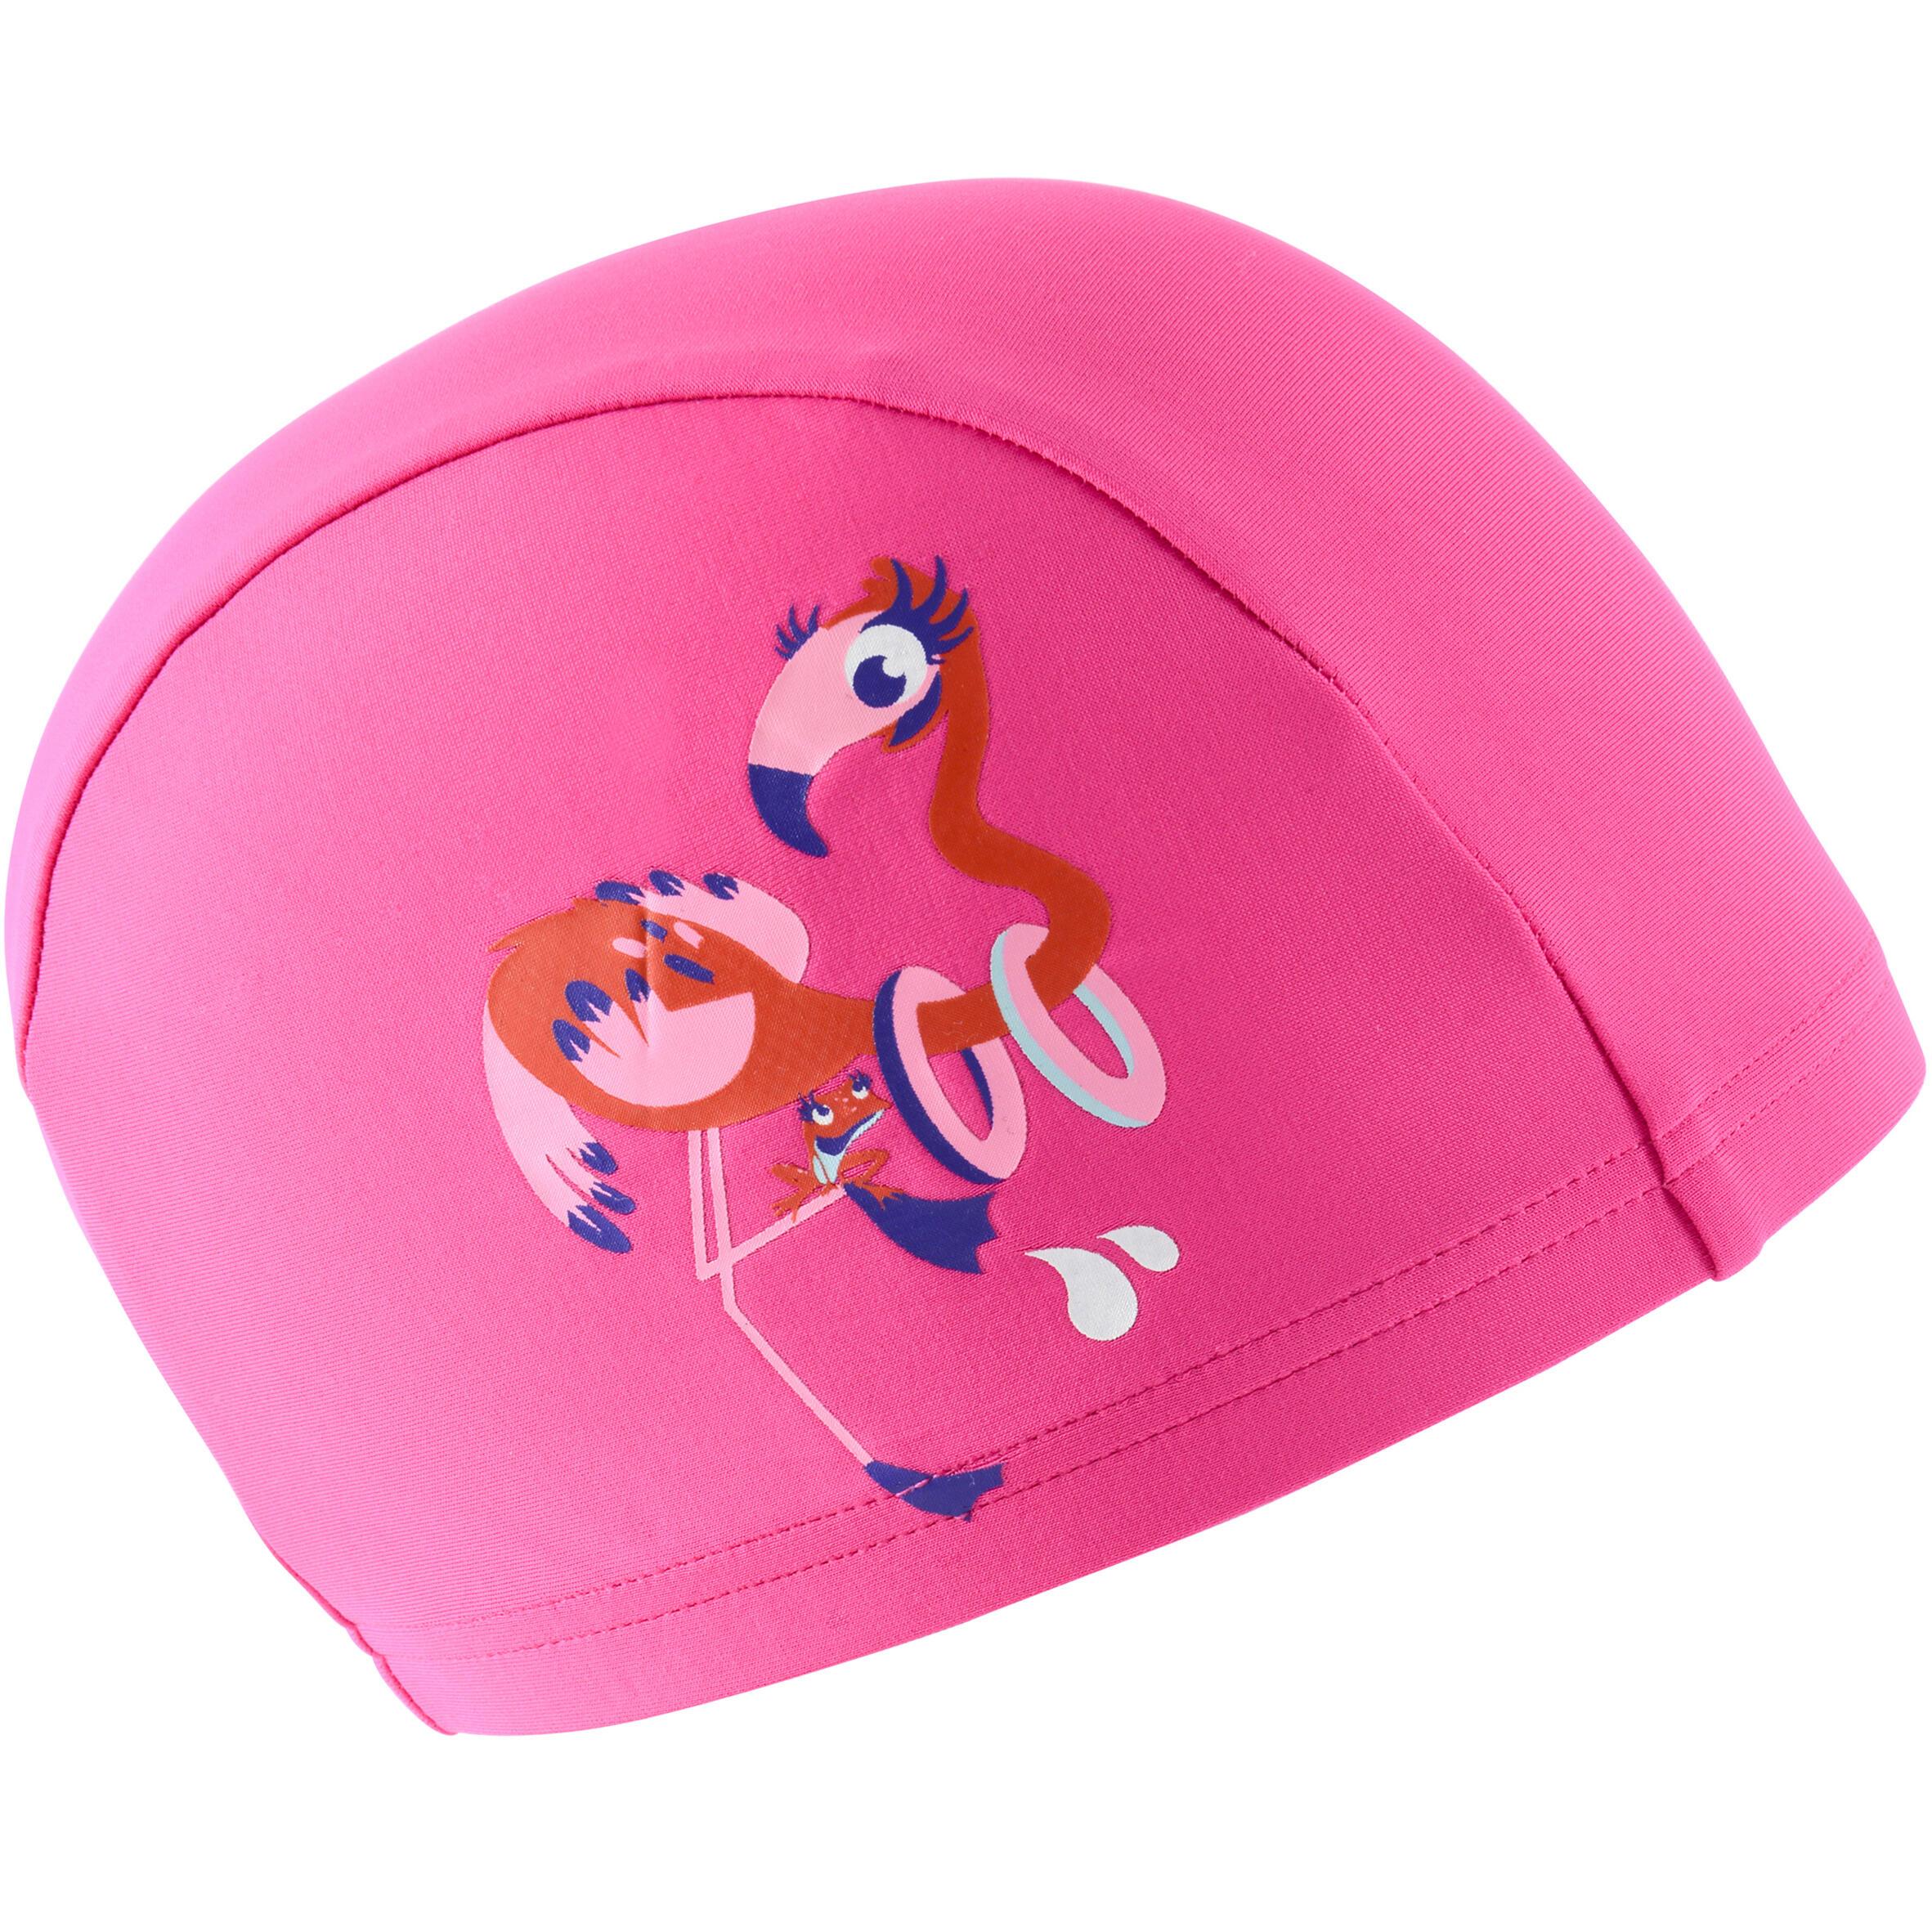 FLAMINGO MESH PRINT SWIM CAP SIZE S - PINK